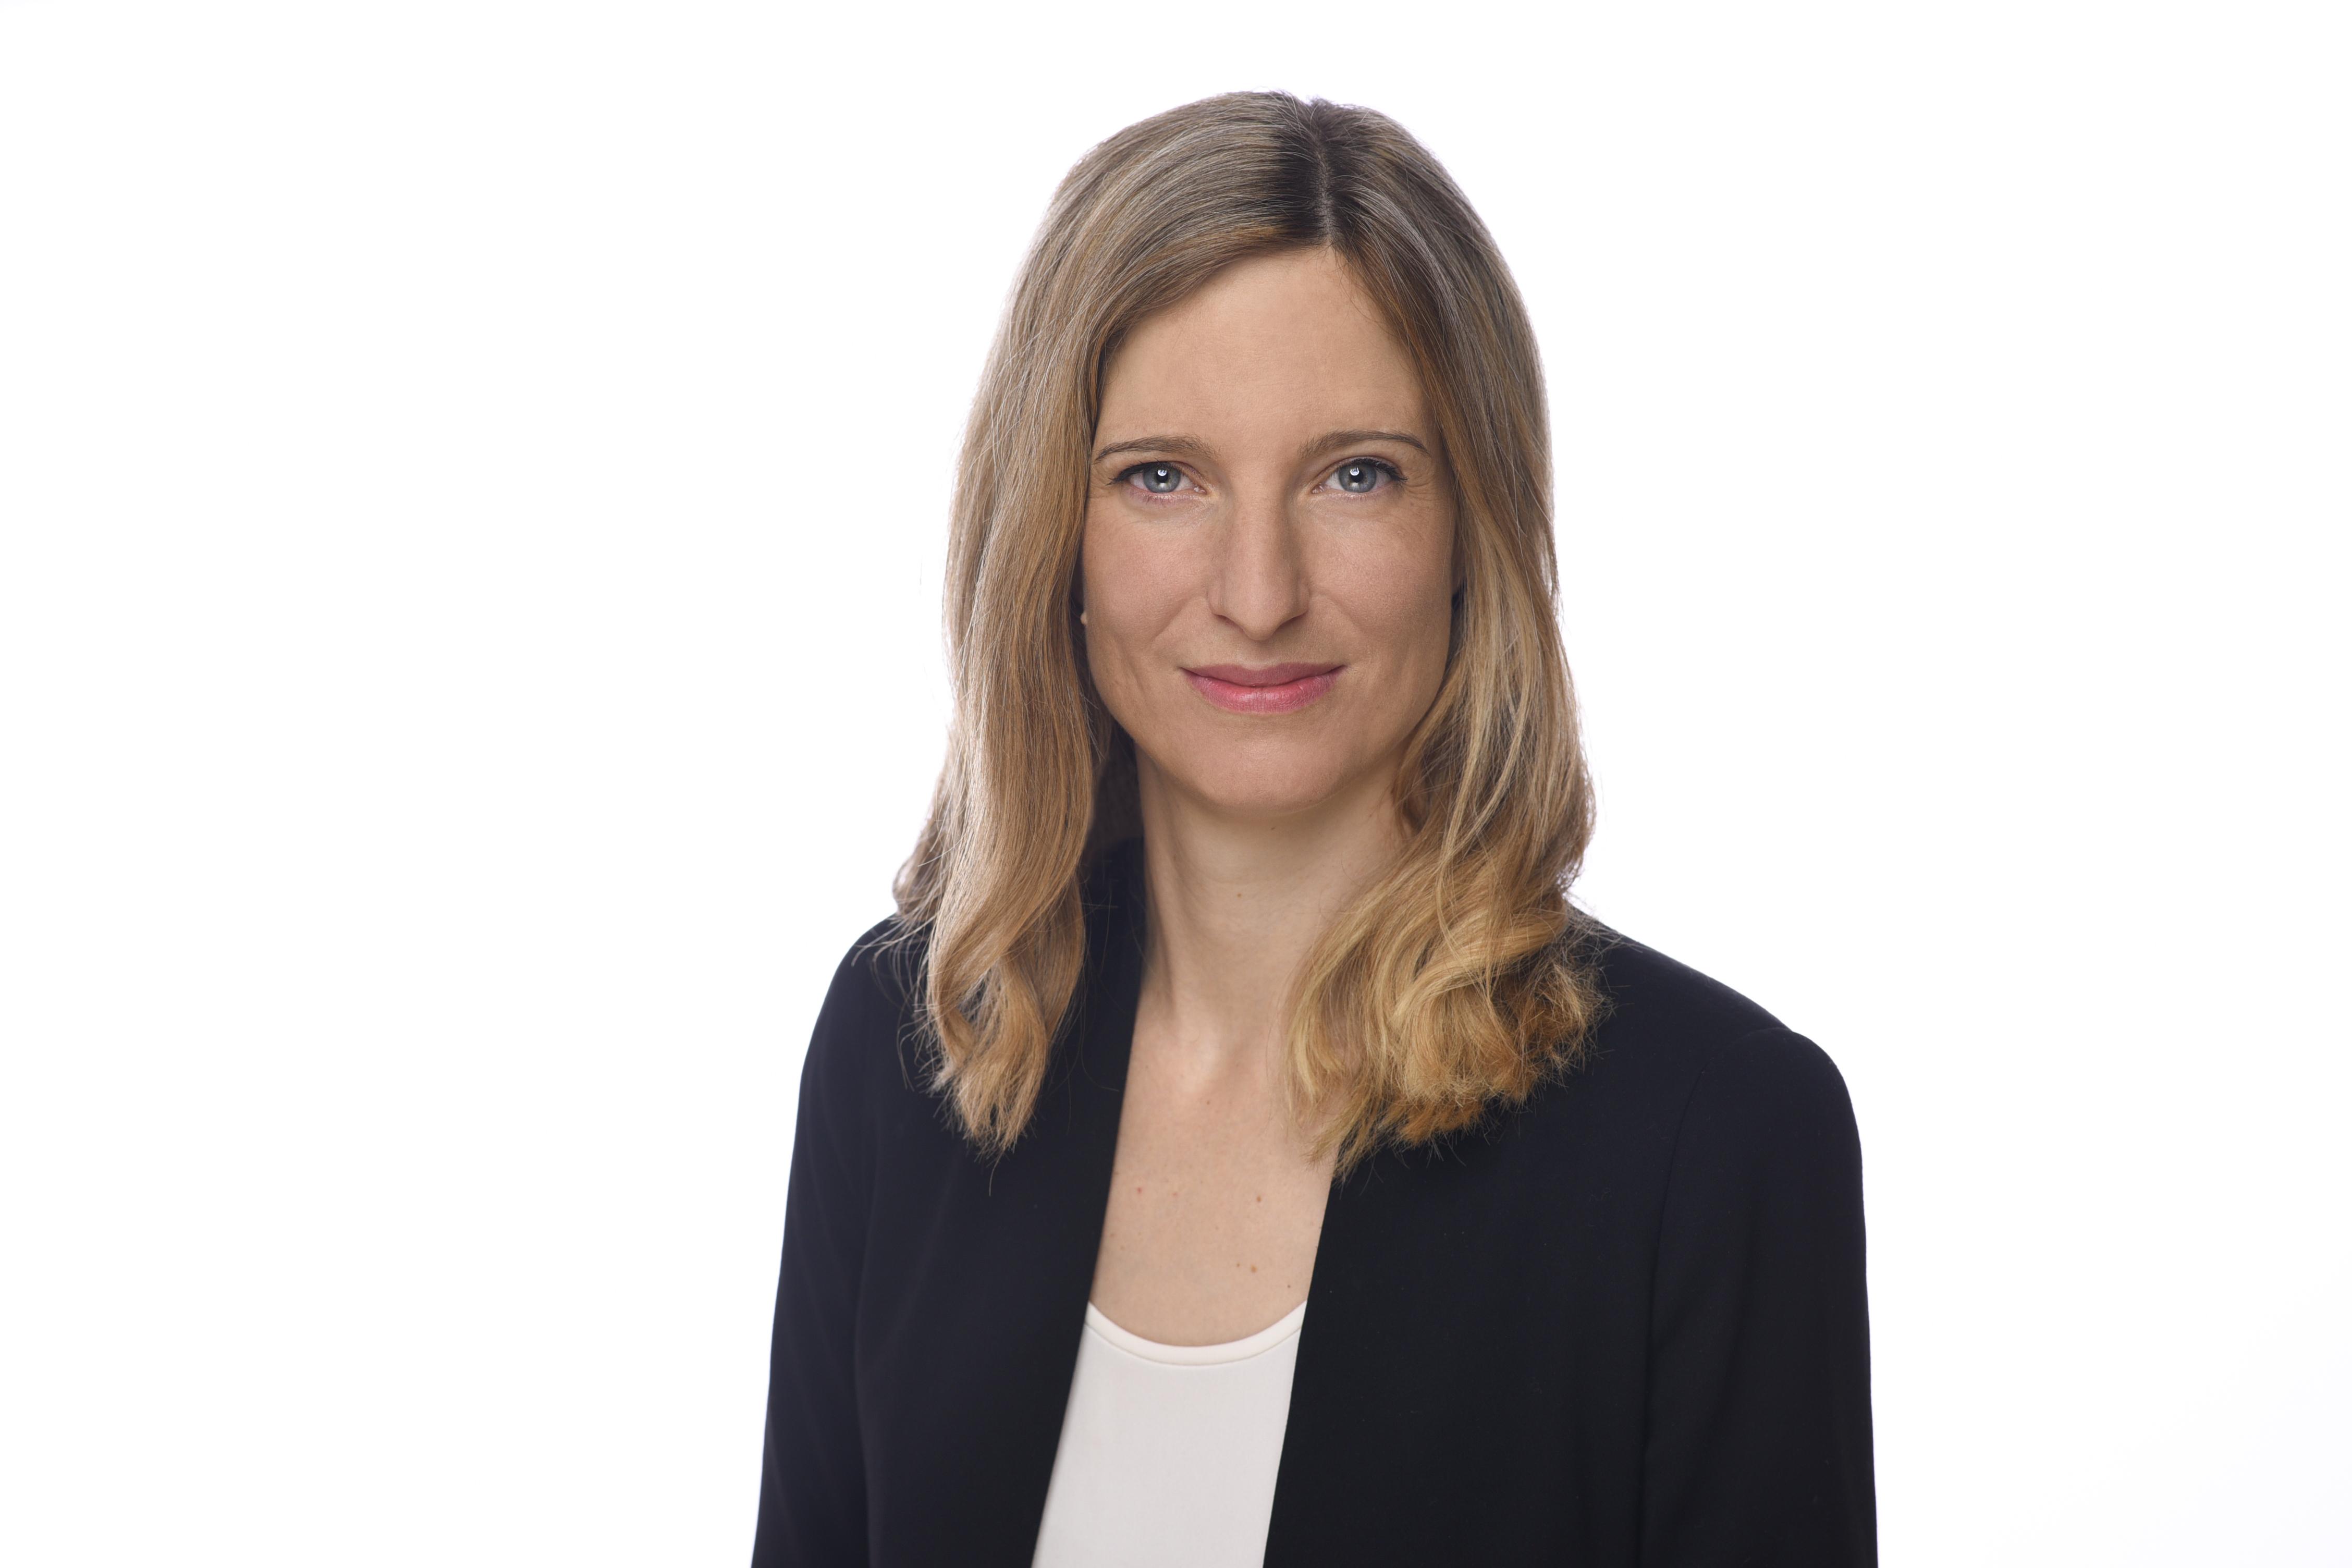 Andrea Deisenrieder